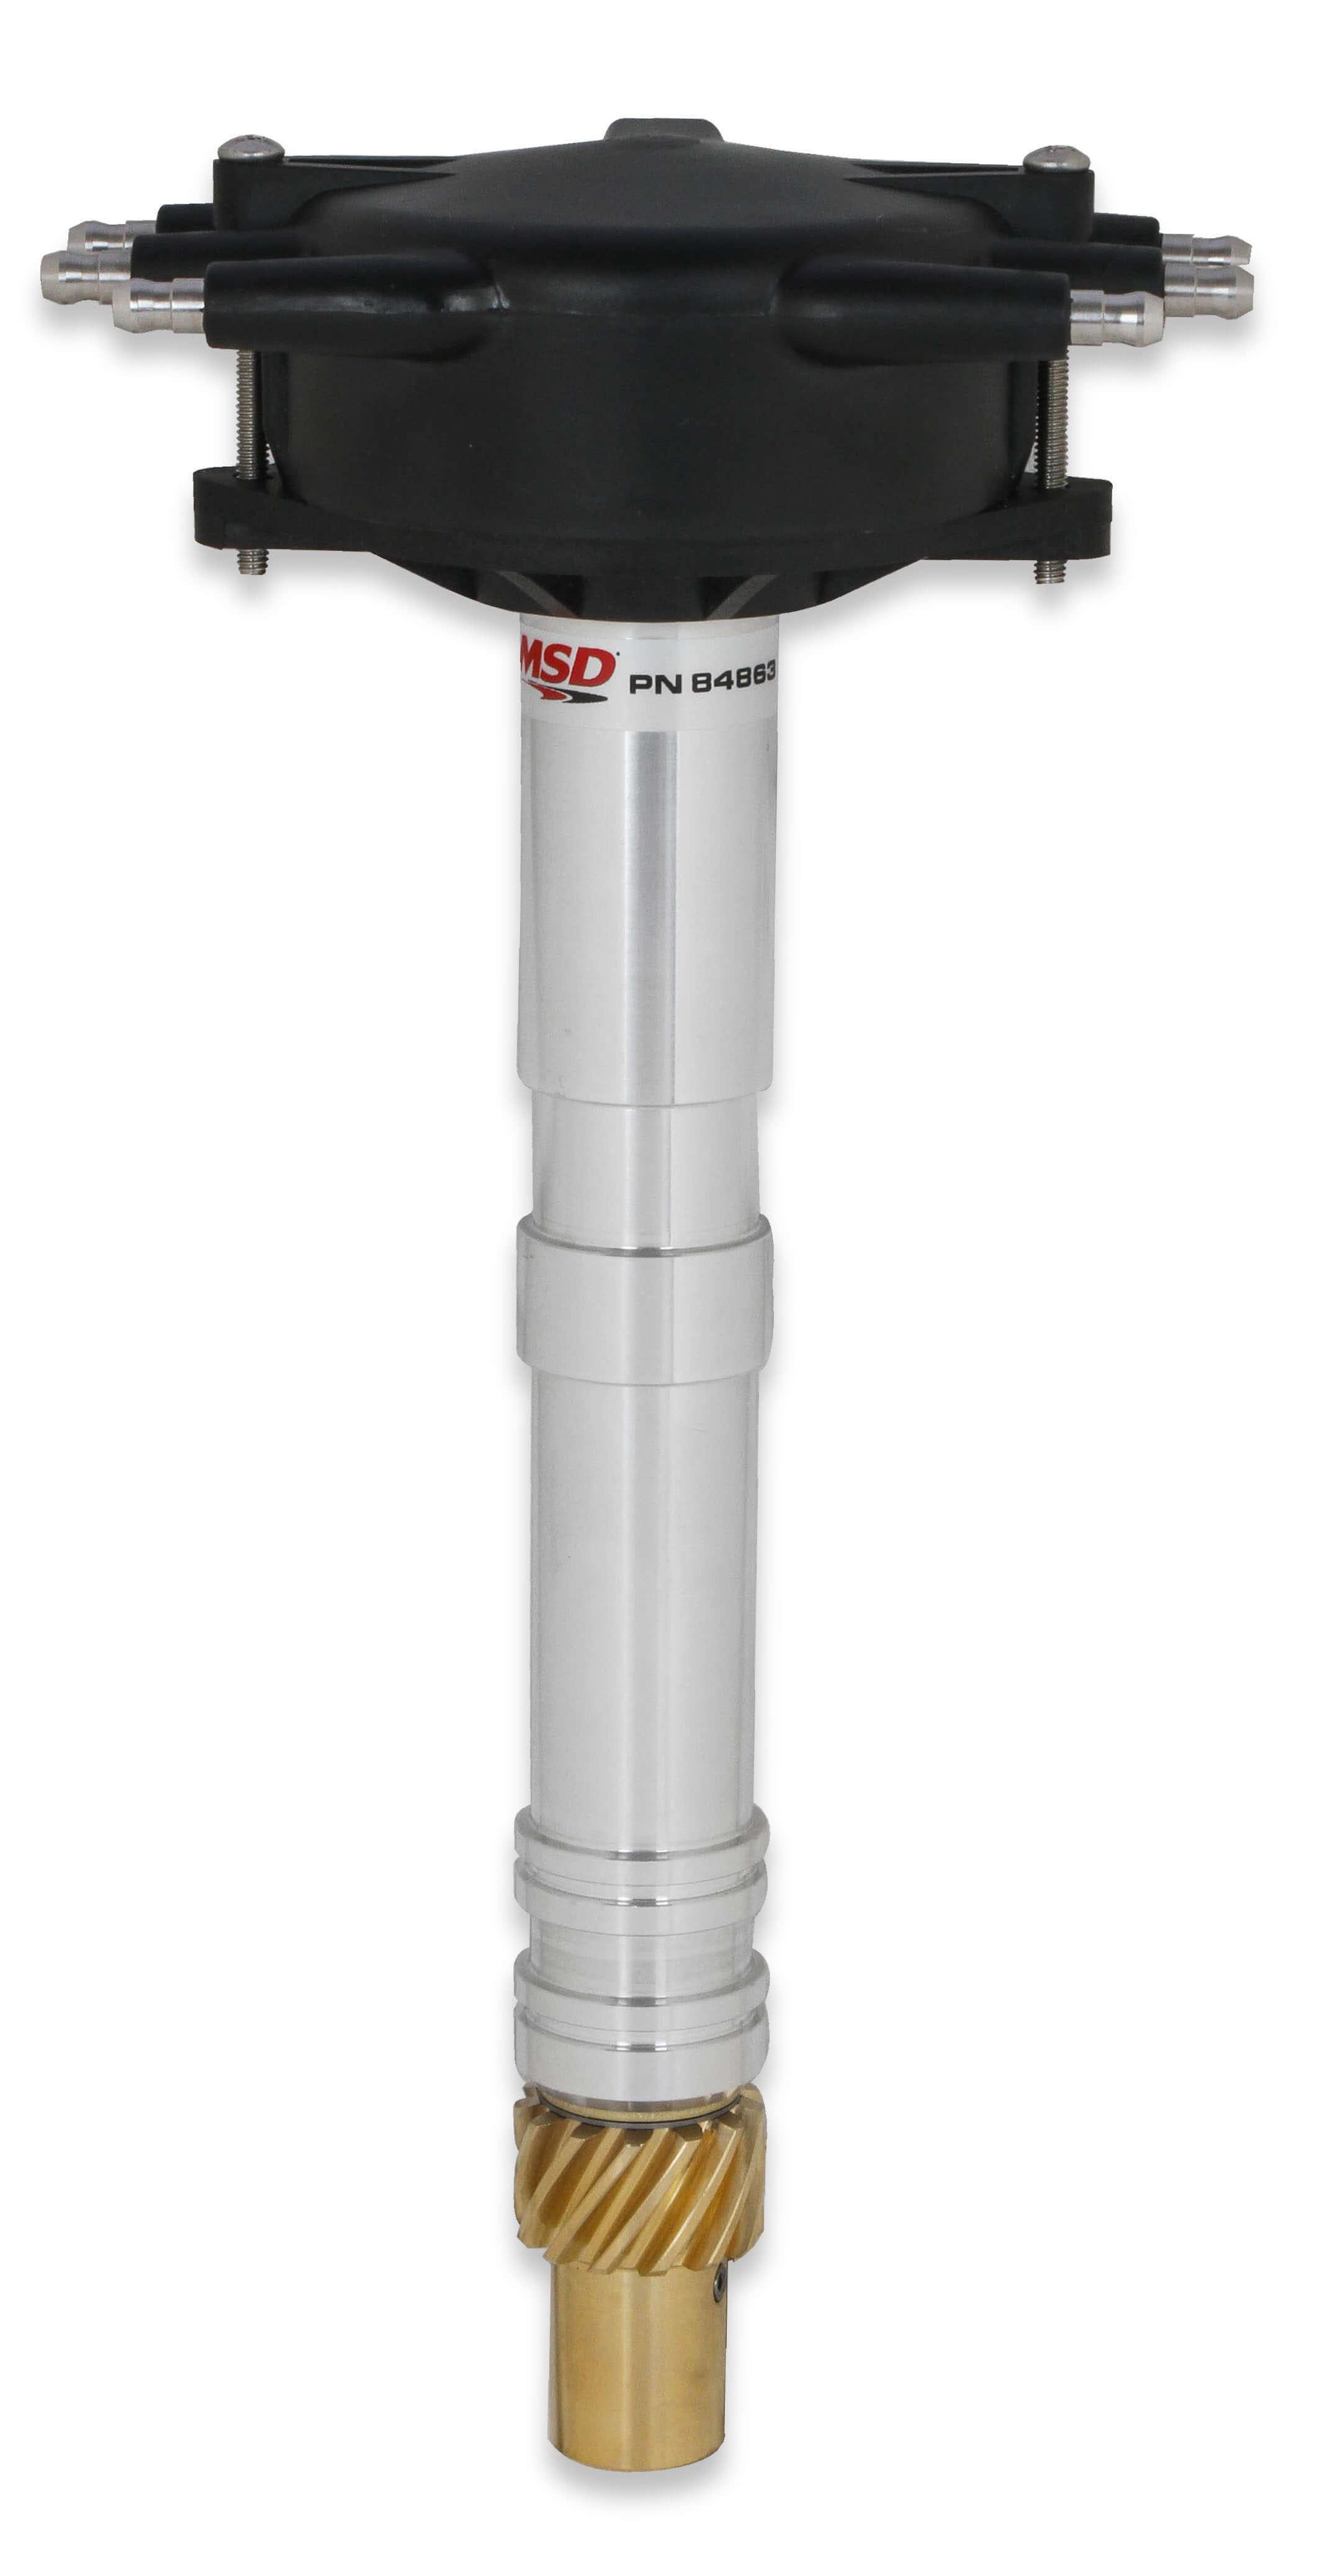 MSD Ignition 84863 Distributor, Pro-Billet, Crank Trigger Pickup, Locked Advance, HEI Style Terminal, Crab Cap, Black, GM W-Series, Each